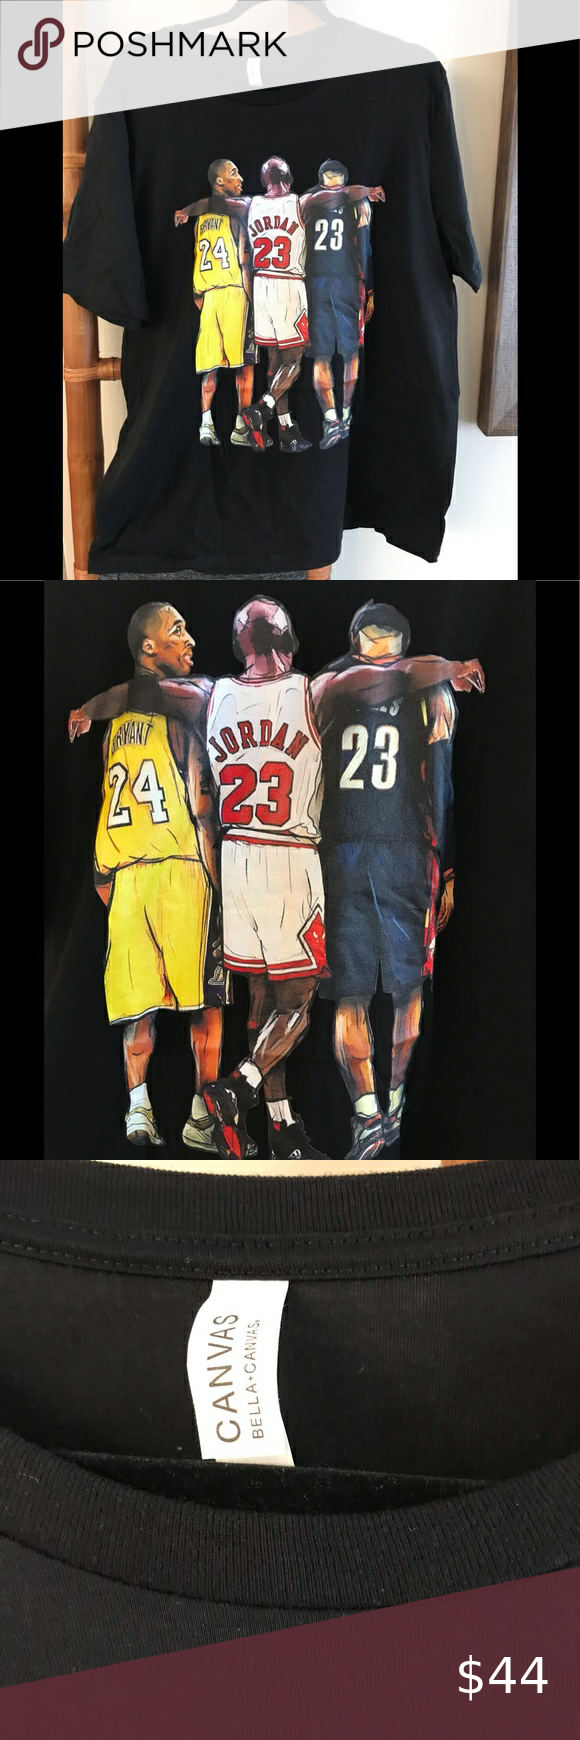 Canvas Kobe Bryant Jordan James Tee New Festival T Shirts Kobe Bryant Tees [ 1740 x 580 Pixel ]